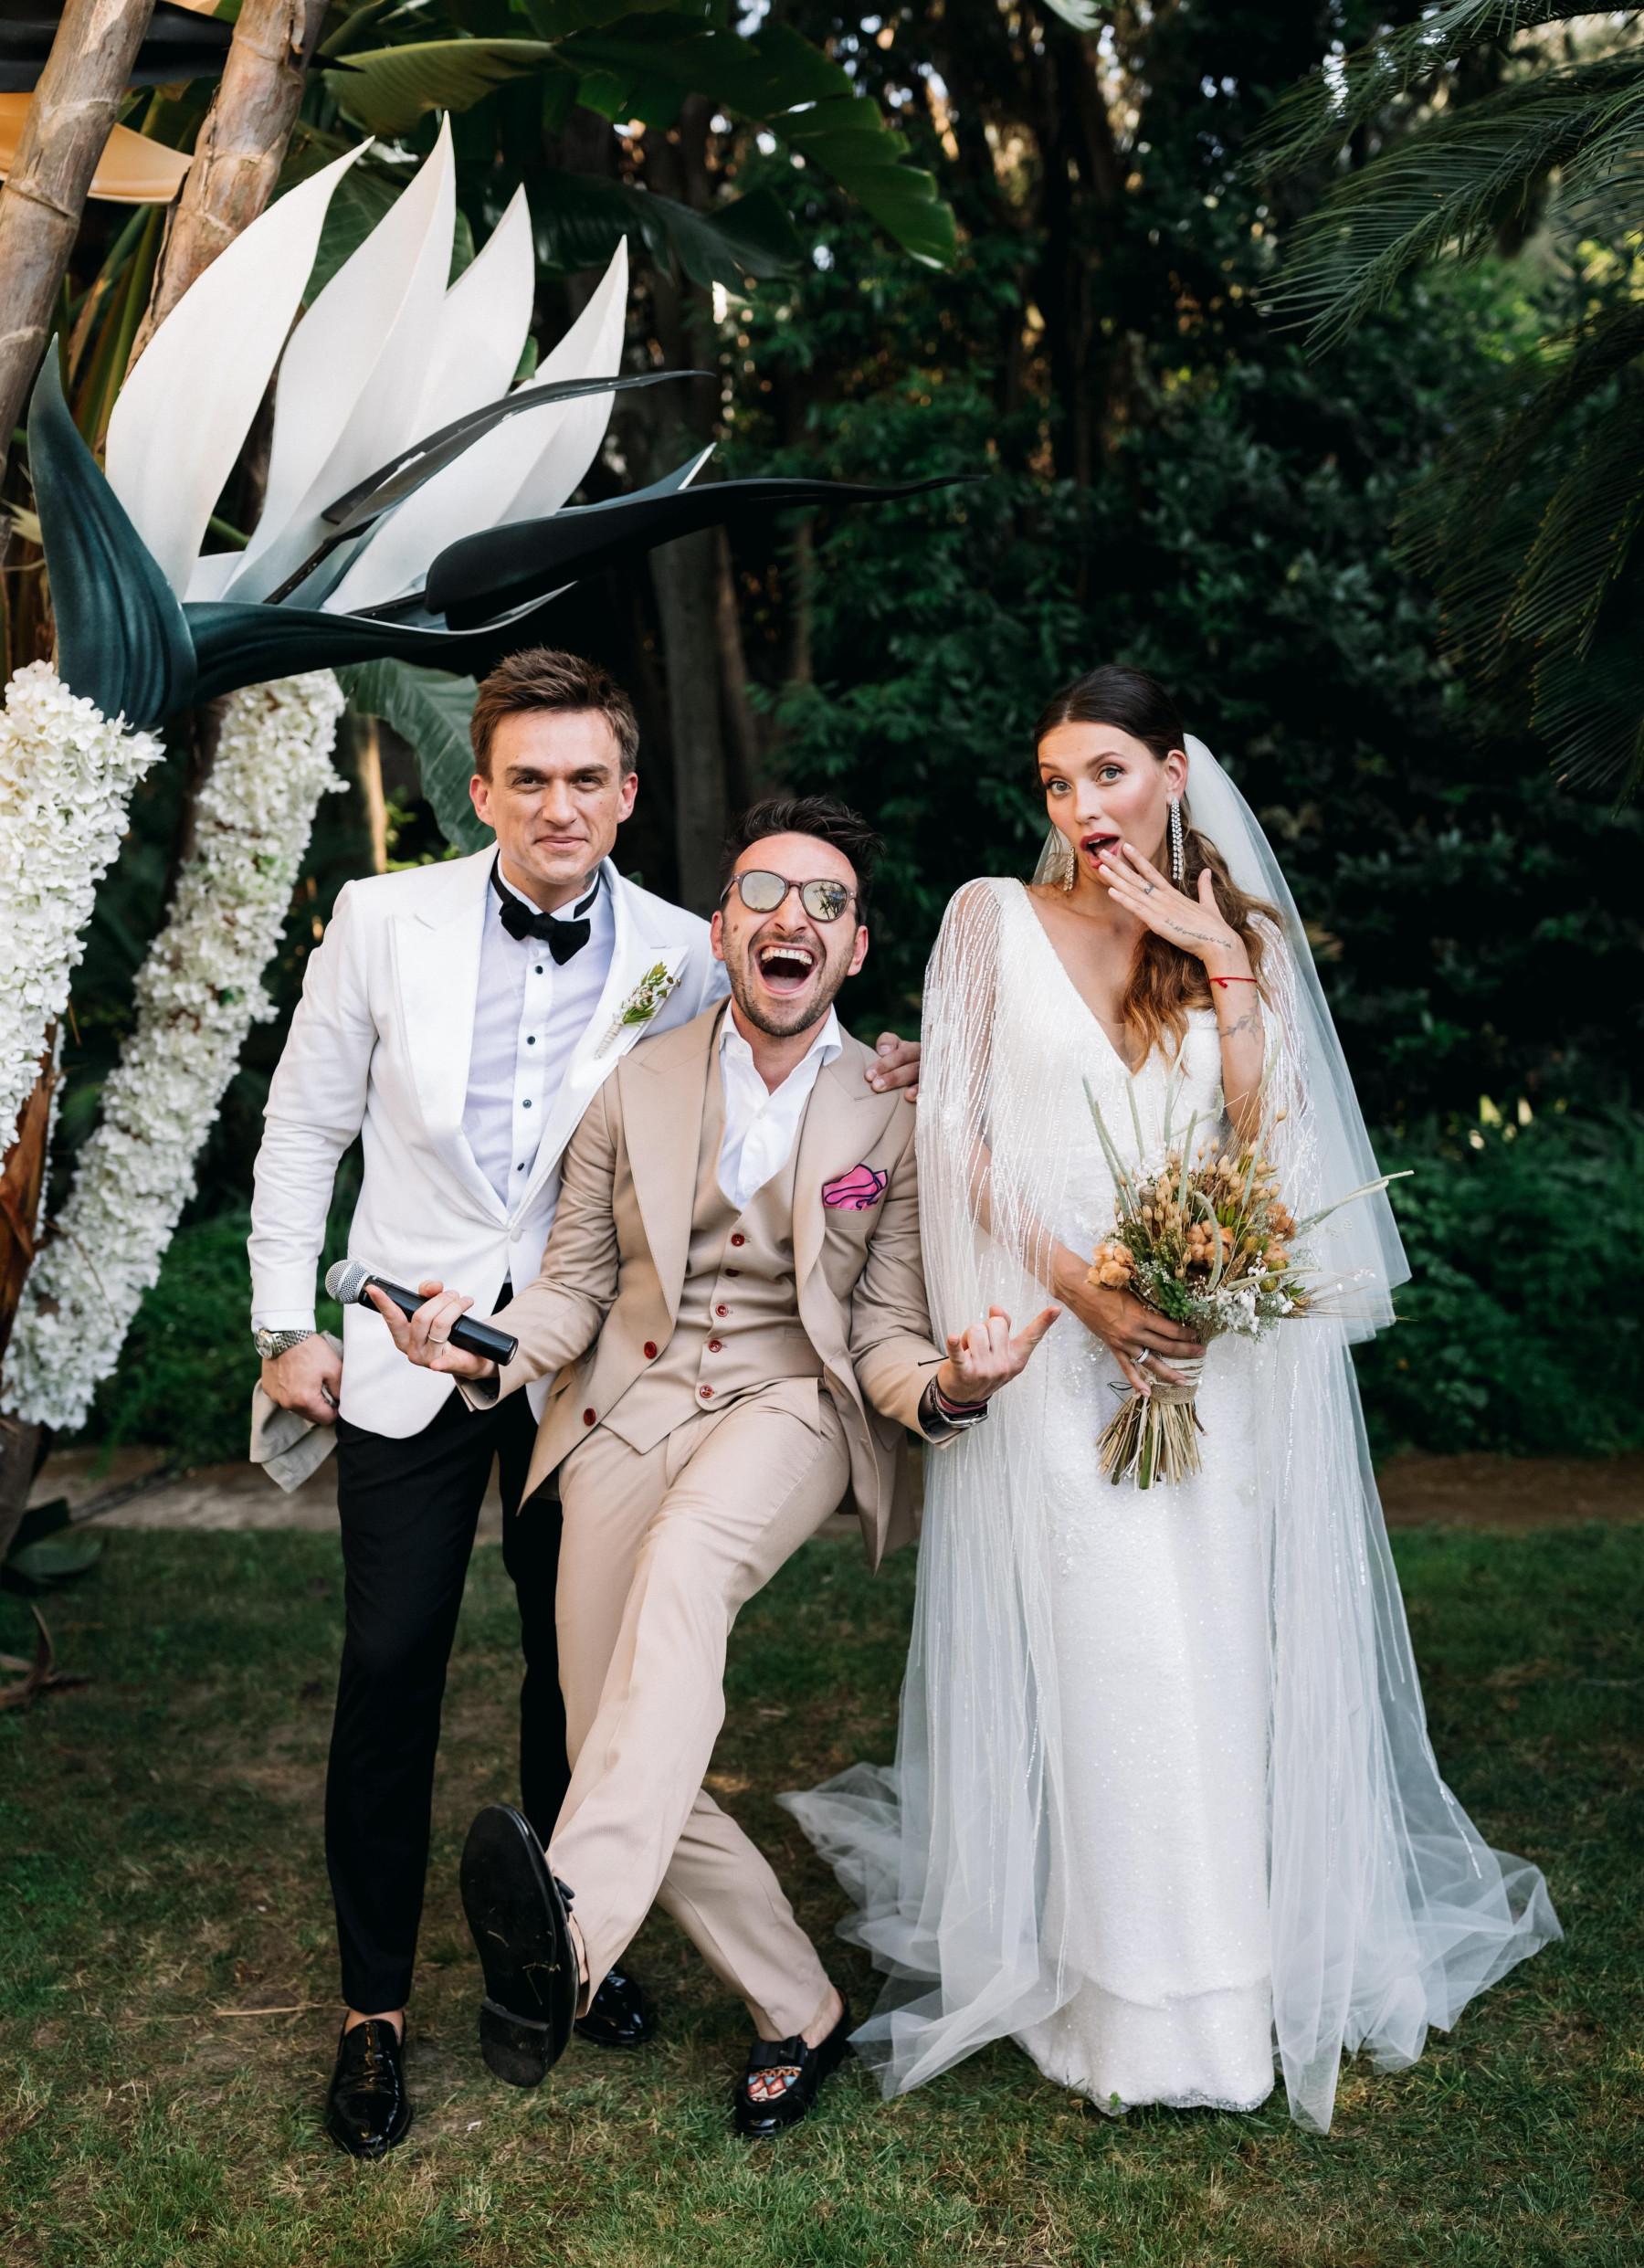 Свадьба Регины Тодоренко и Влада Топалова